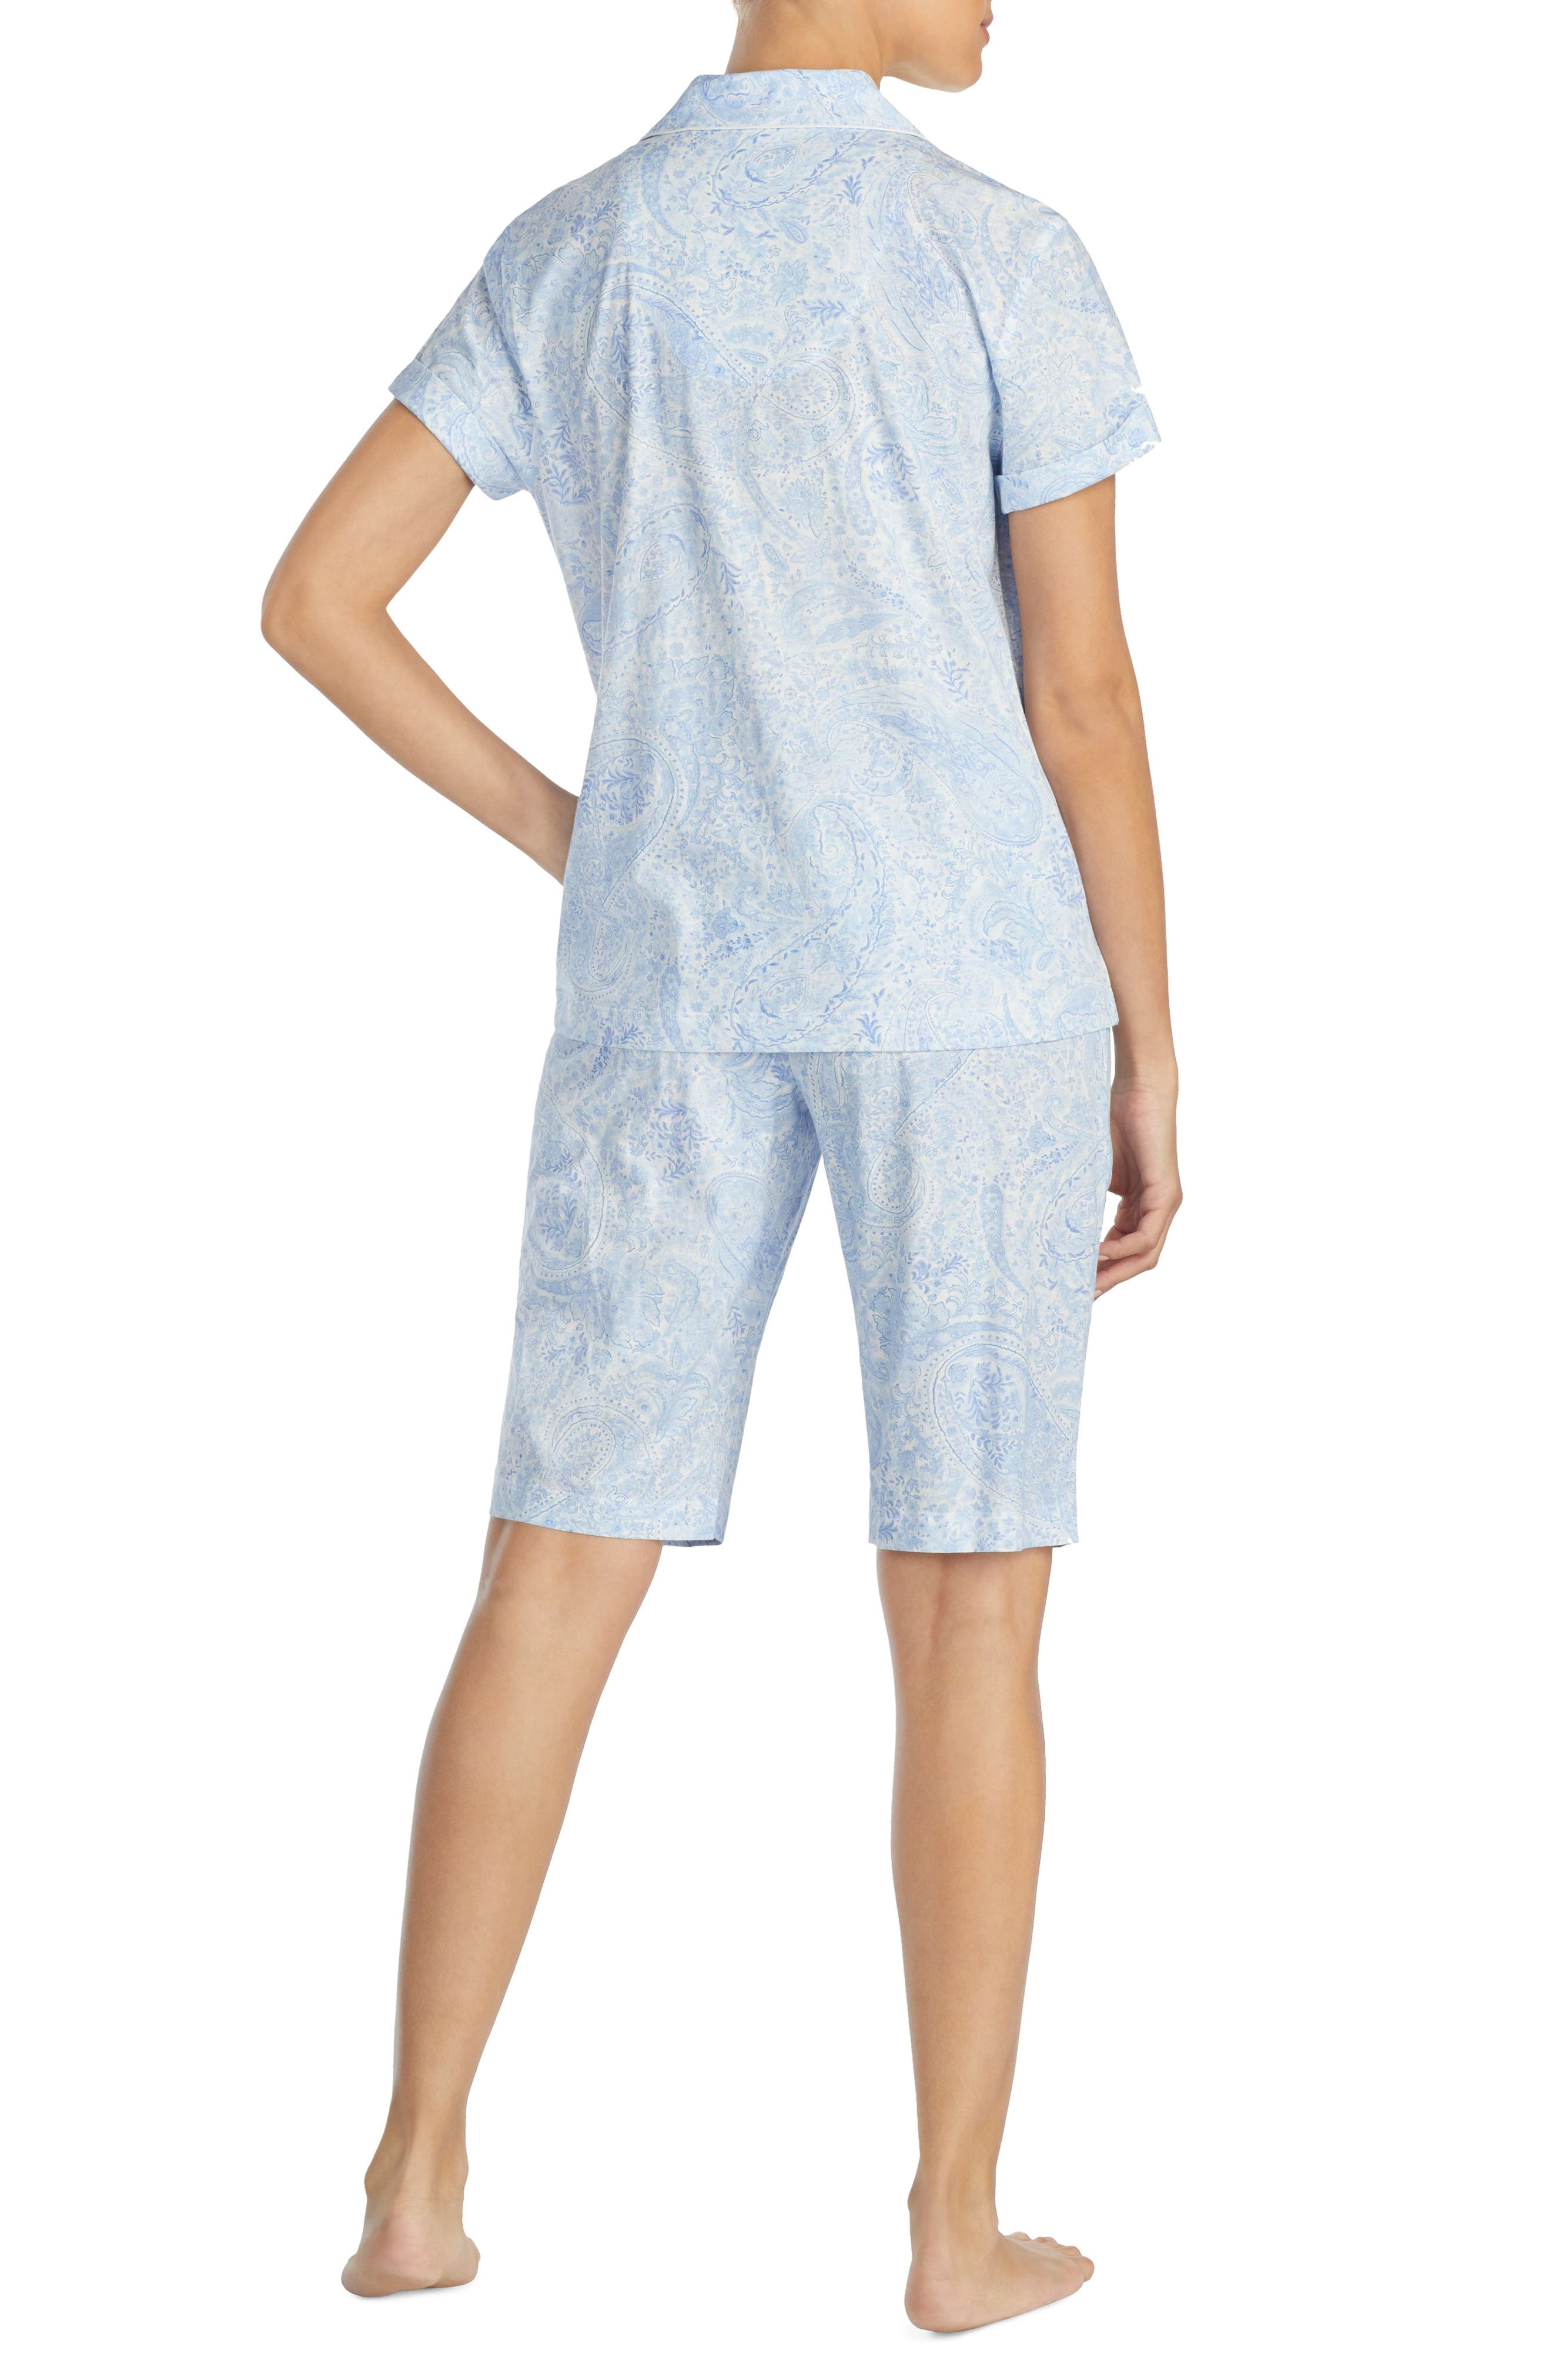 Short Pajamas,                             Alternate thumbnail 2, color,                             Blue Print